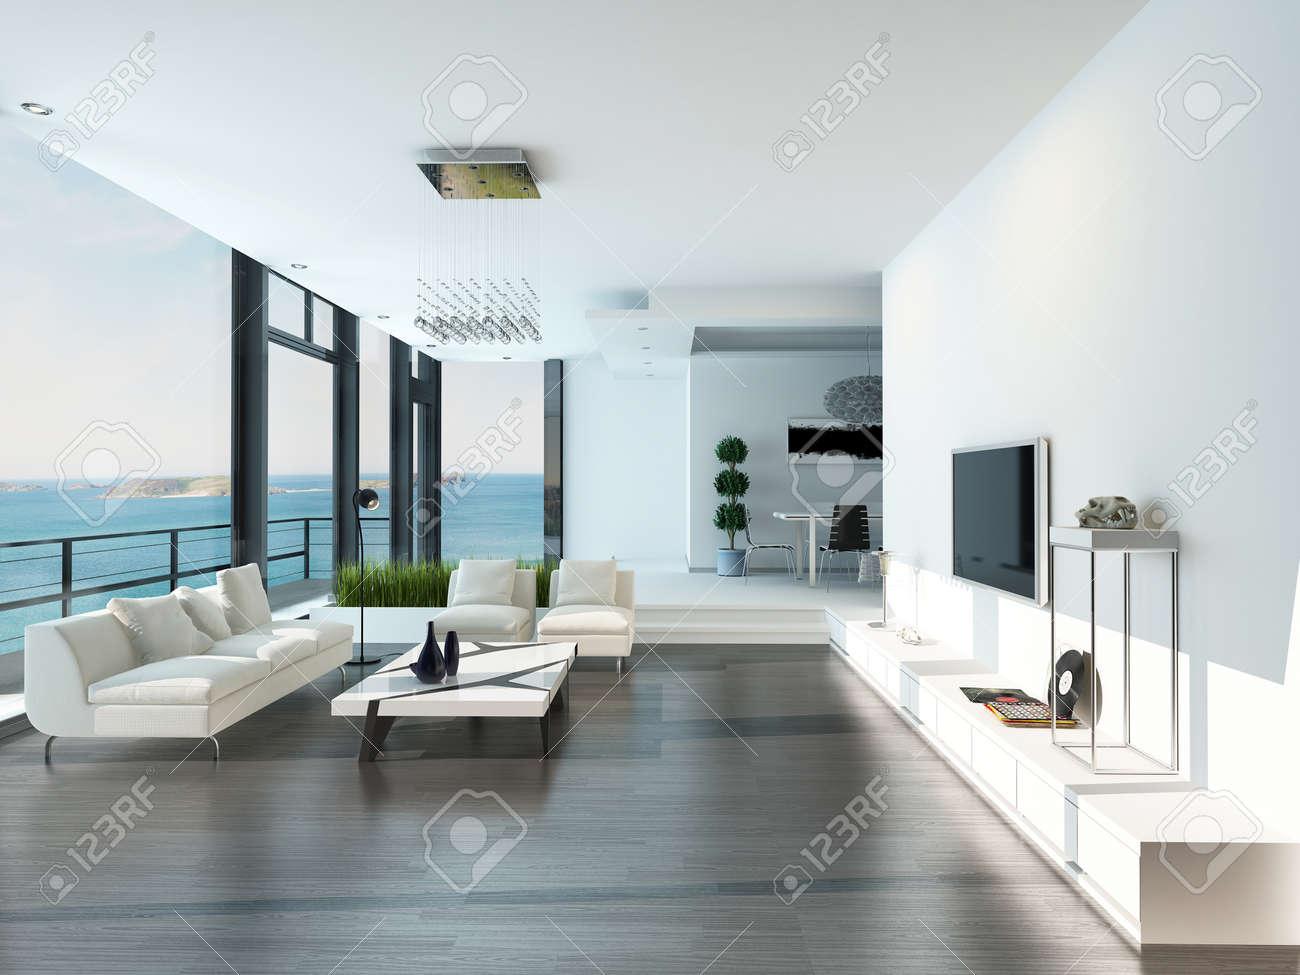 Moderne luxe woonkamer interieur royalty vrije foto, plaatjes ...